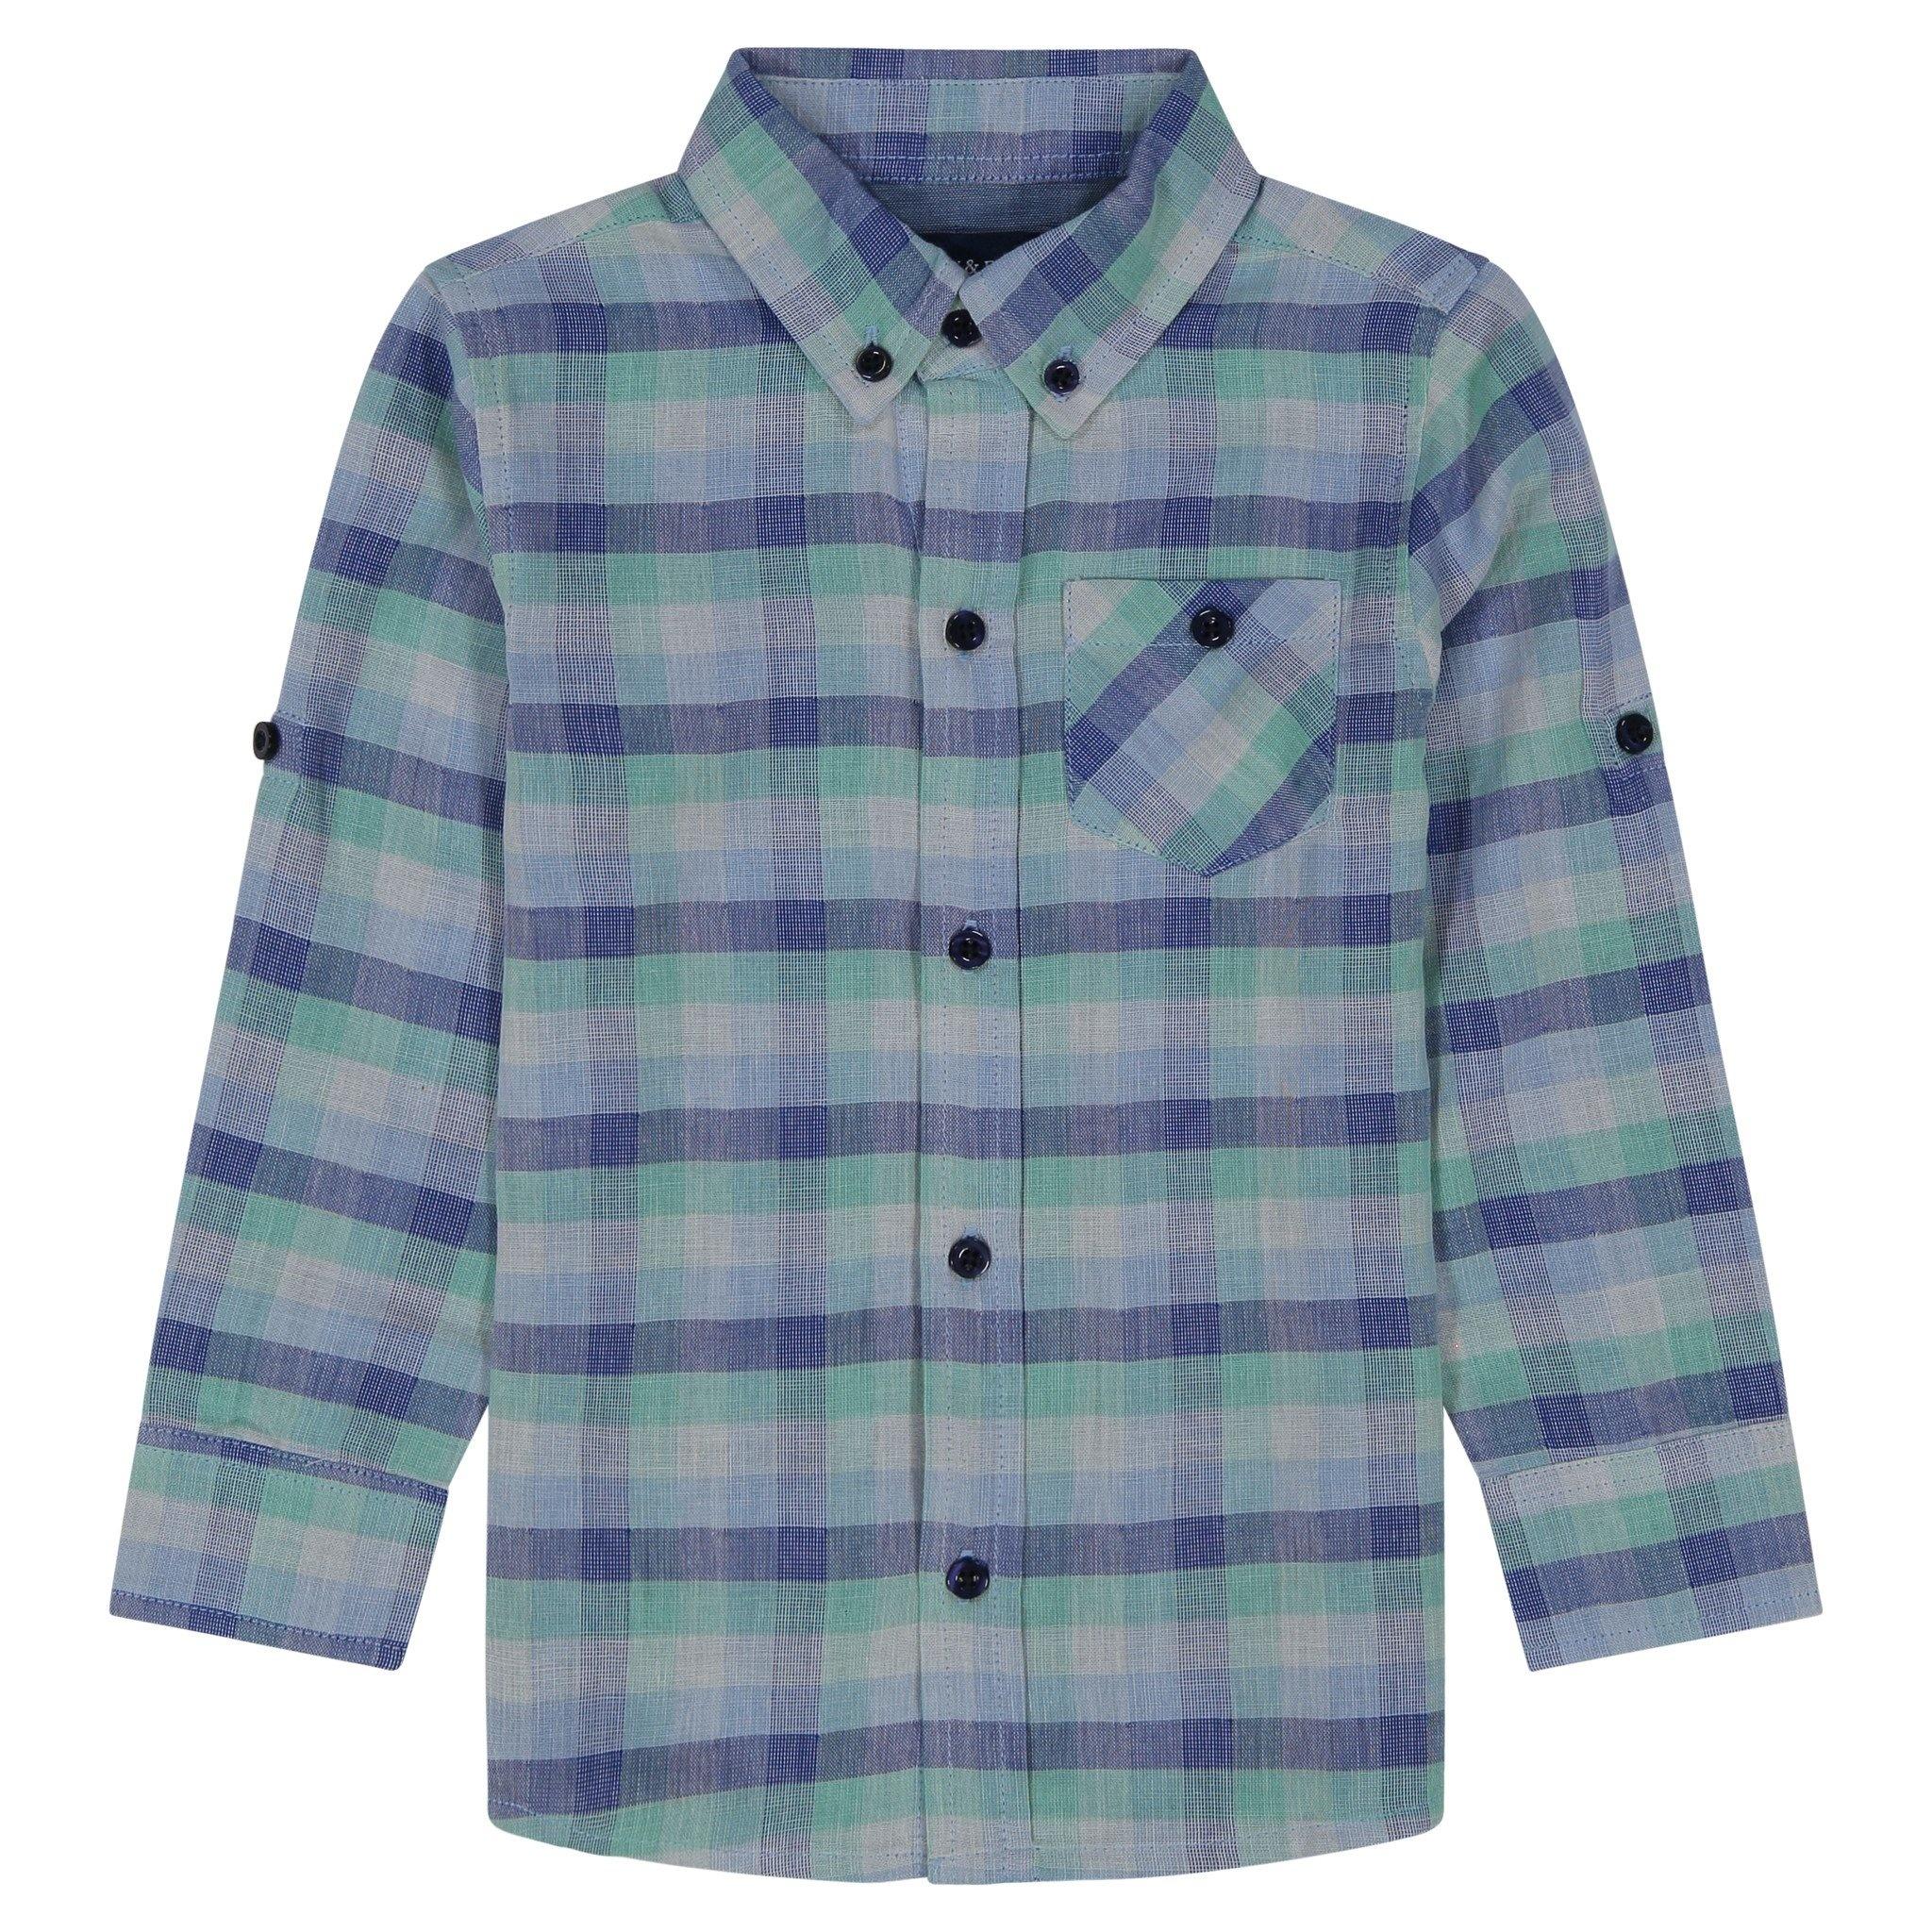 Andy & Evan Aqua Two-Faced Button-down Shirt